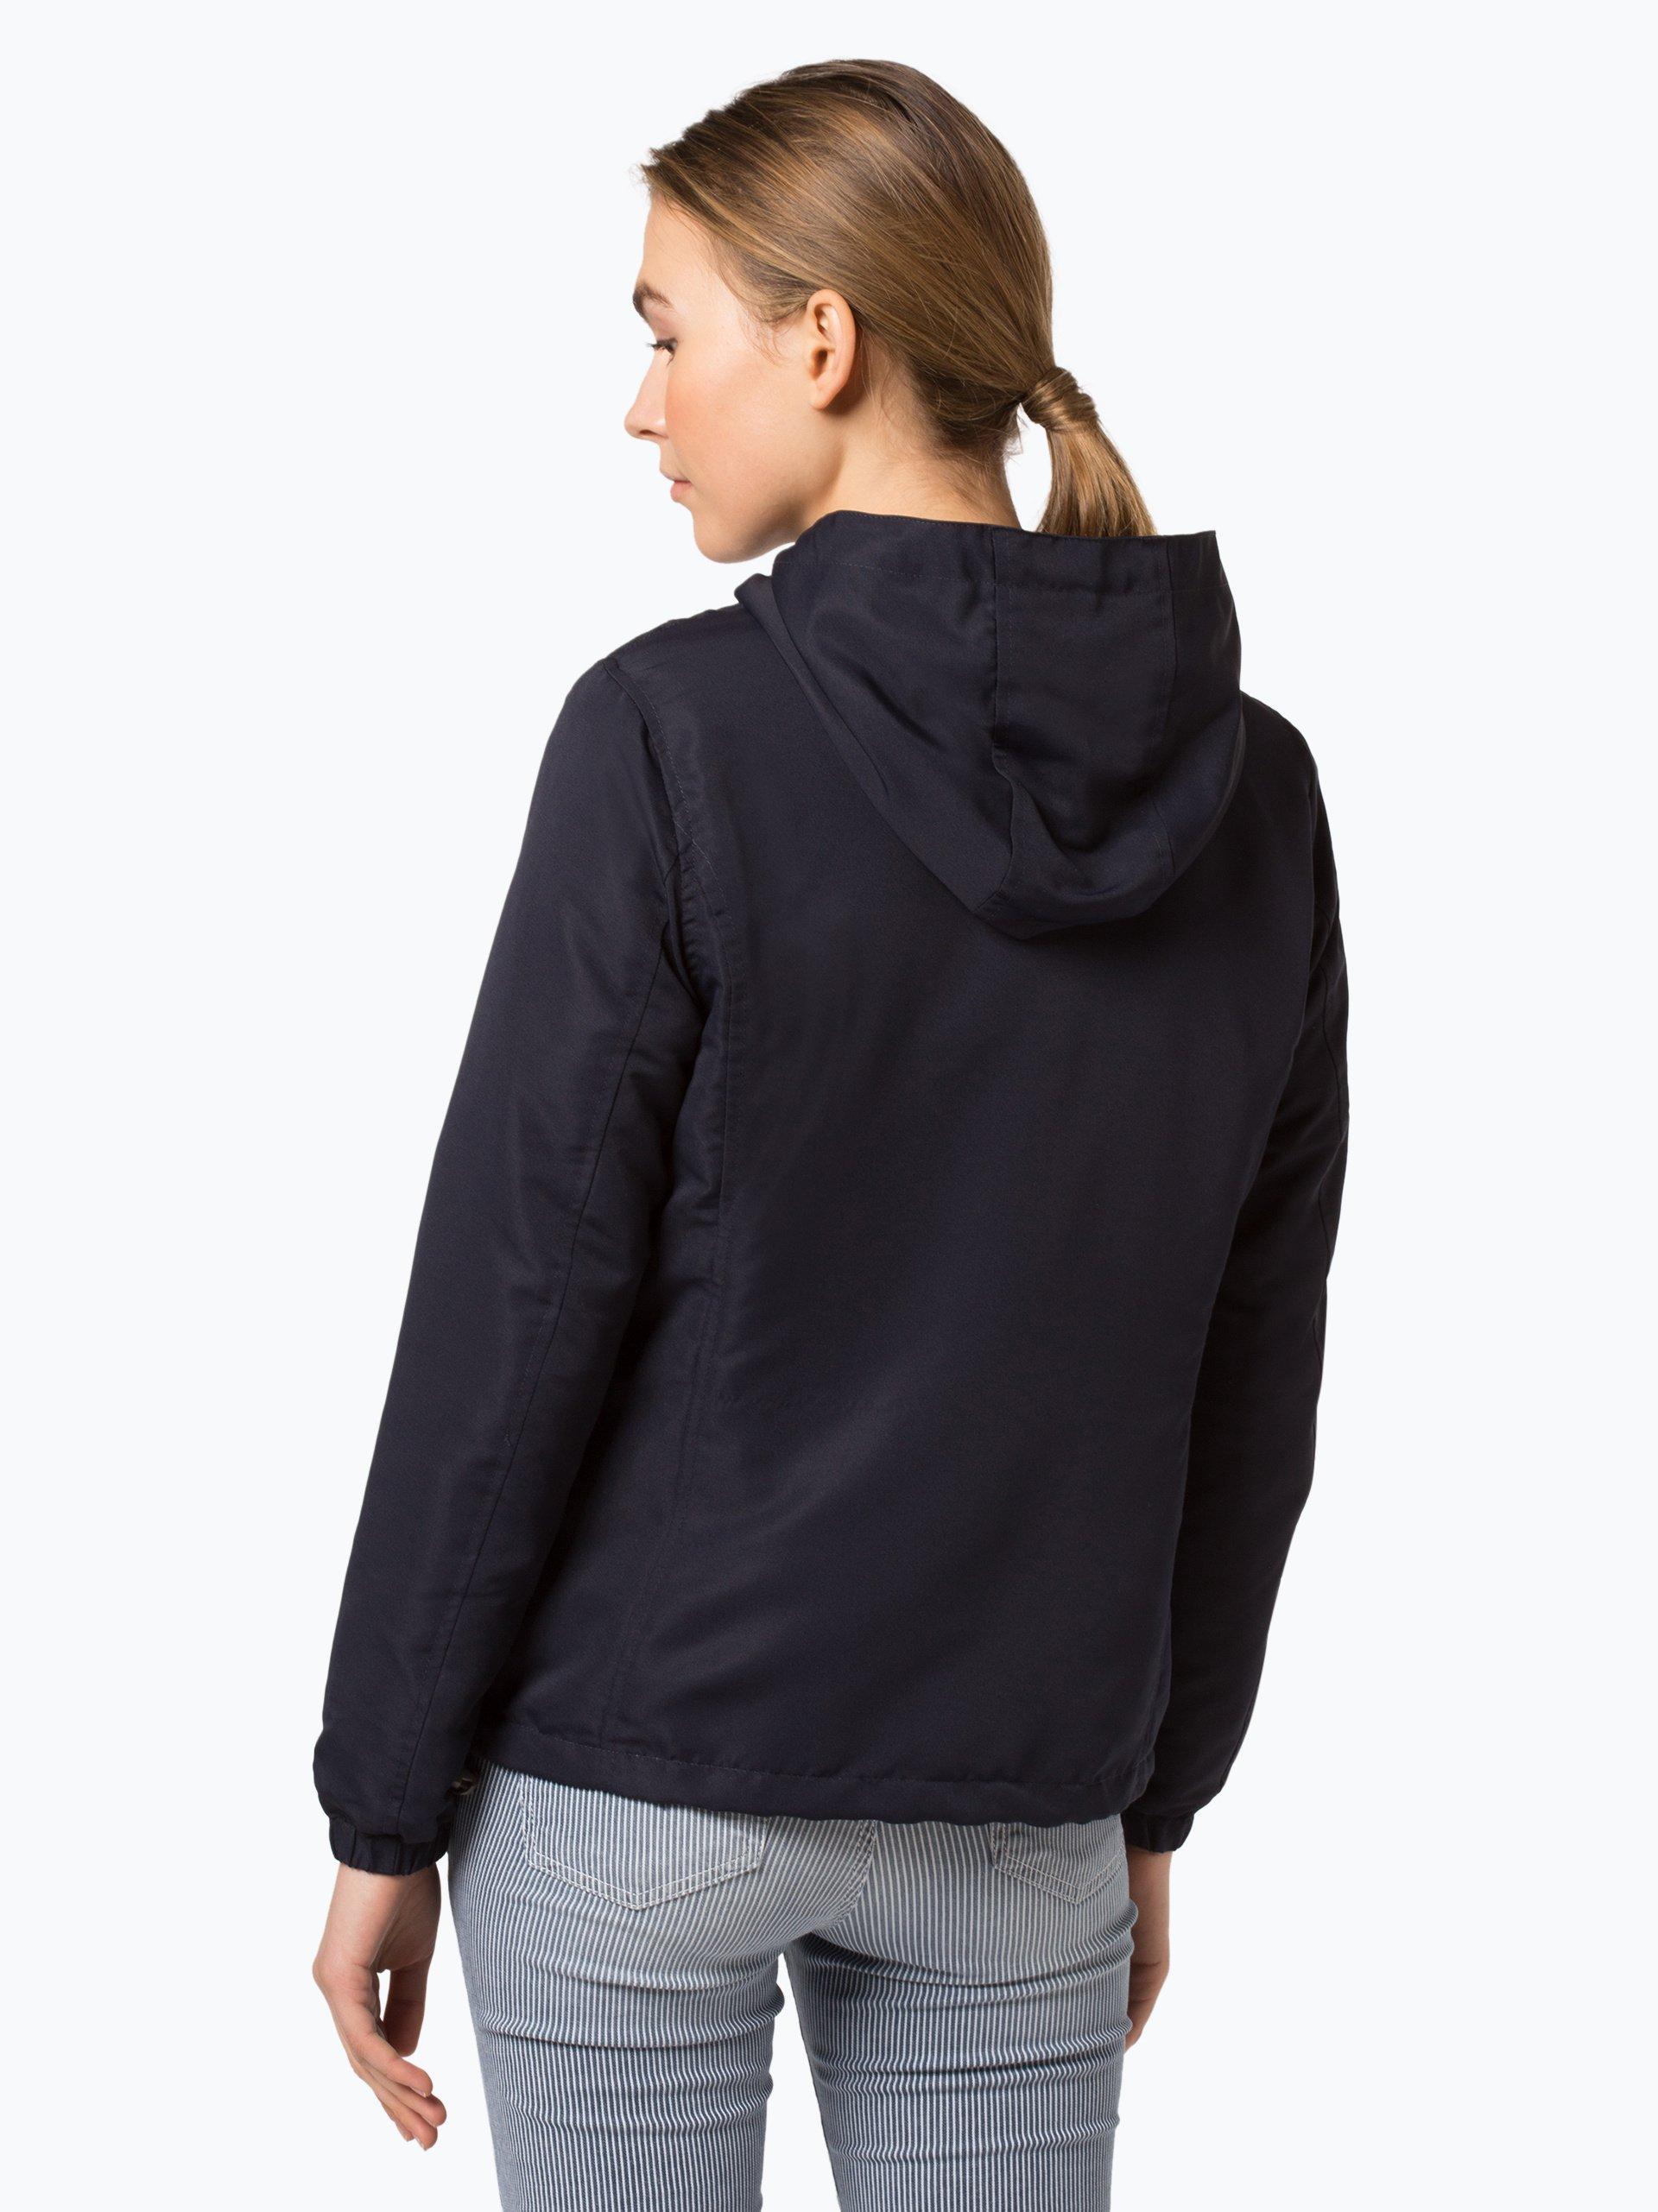 Marie Lund Sport Damen Jacke